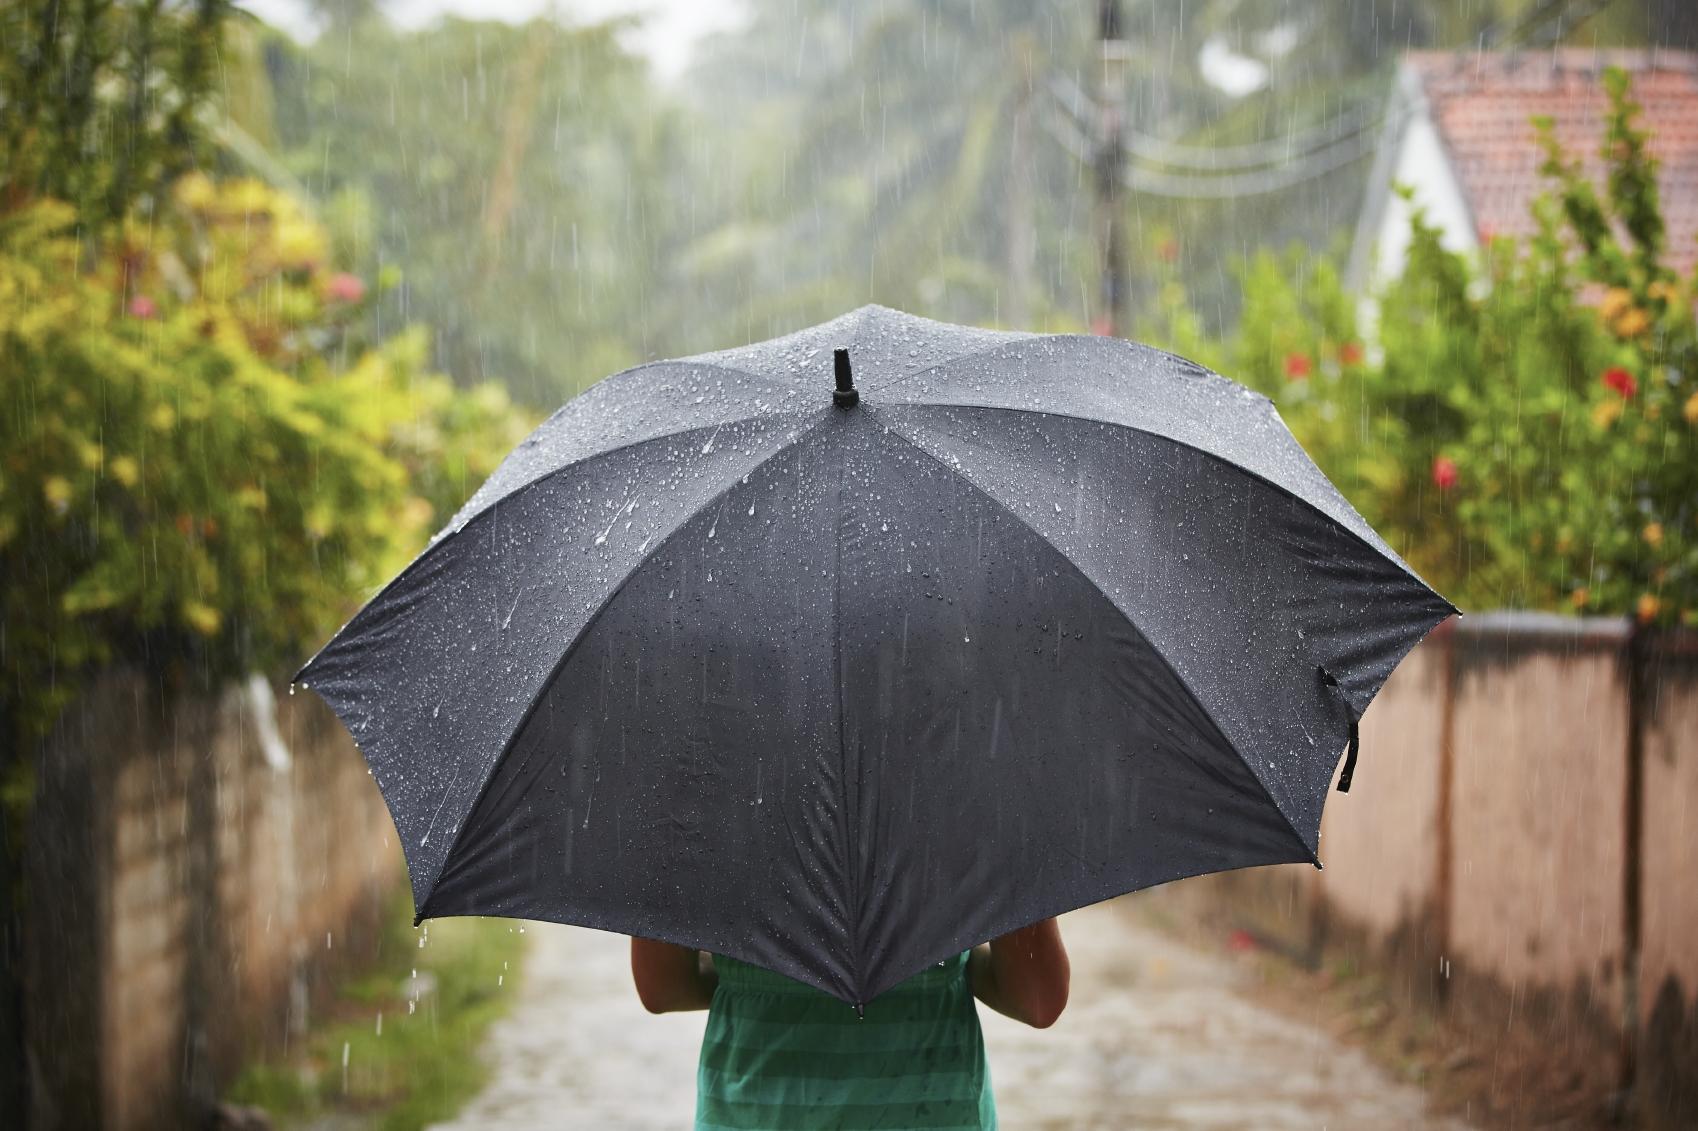 A woman with a black umbrella in heavy rain.